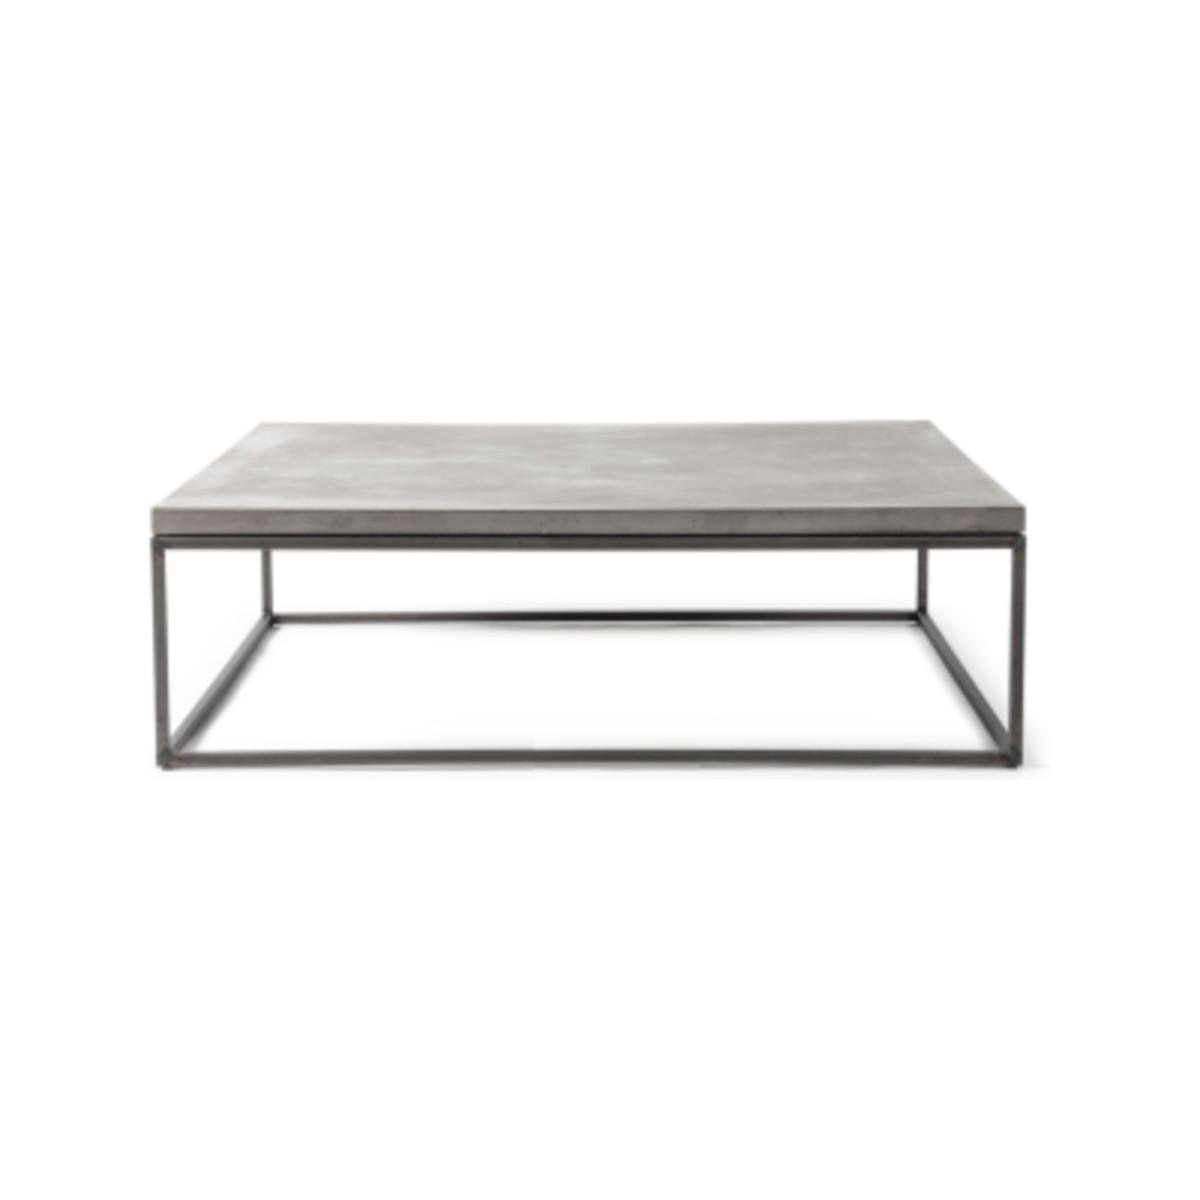 Side Table 100 Cm.Shop Concrete Perspective Side Table